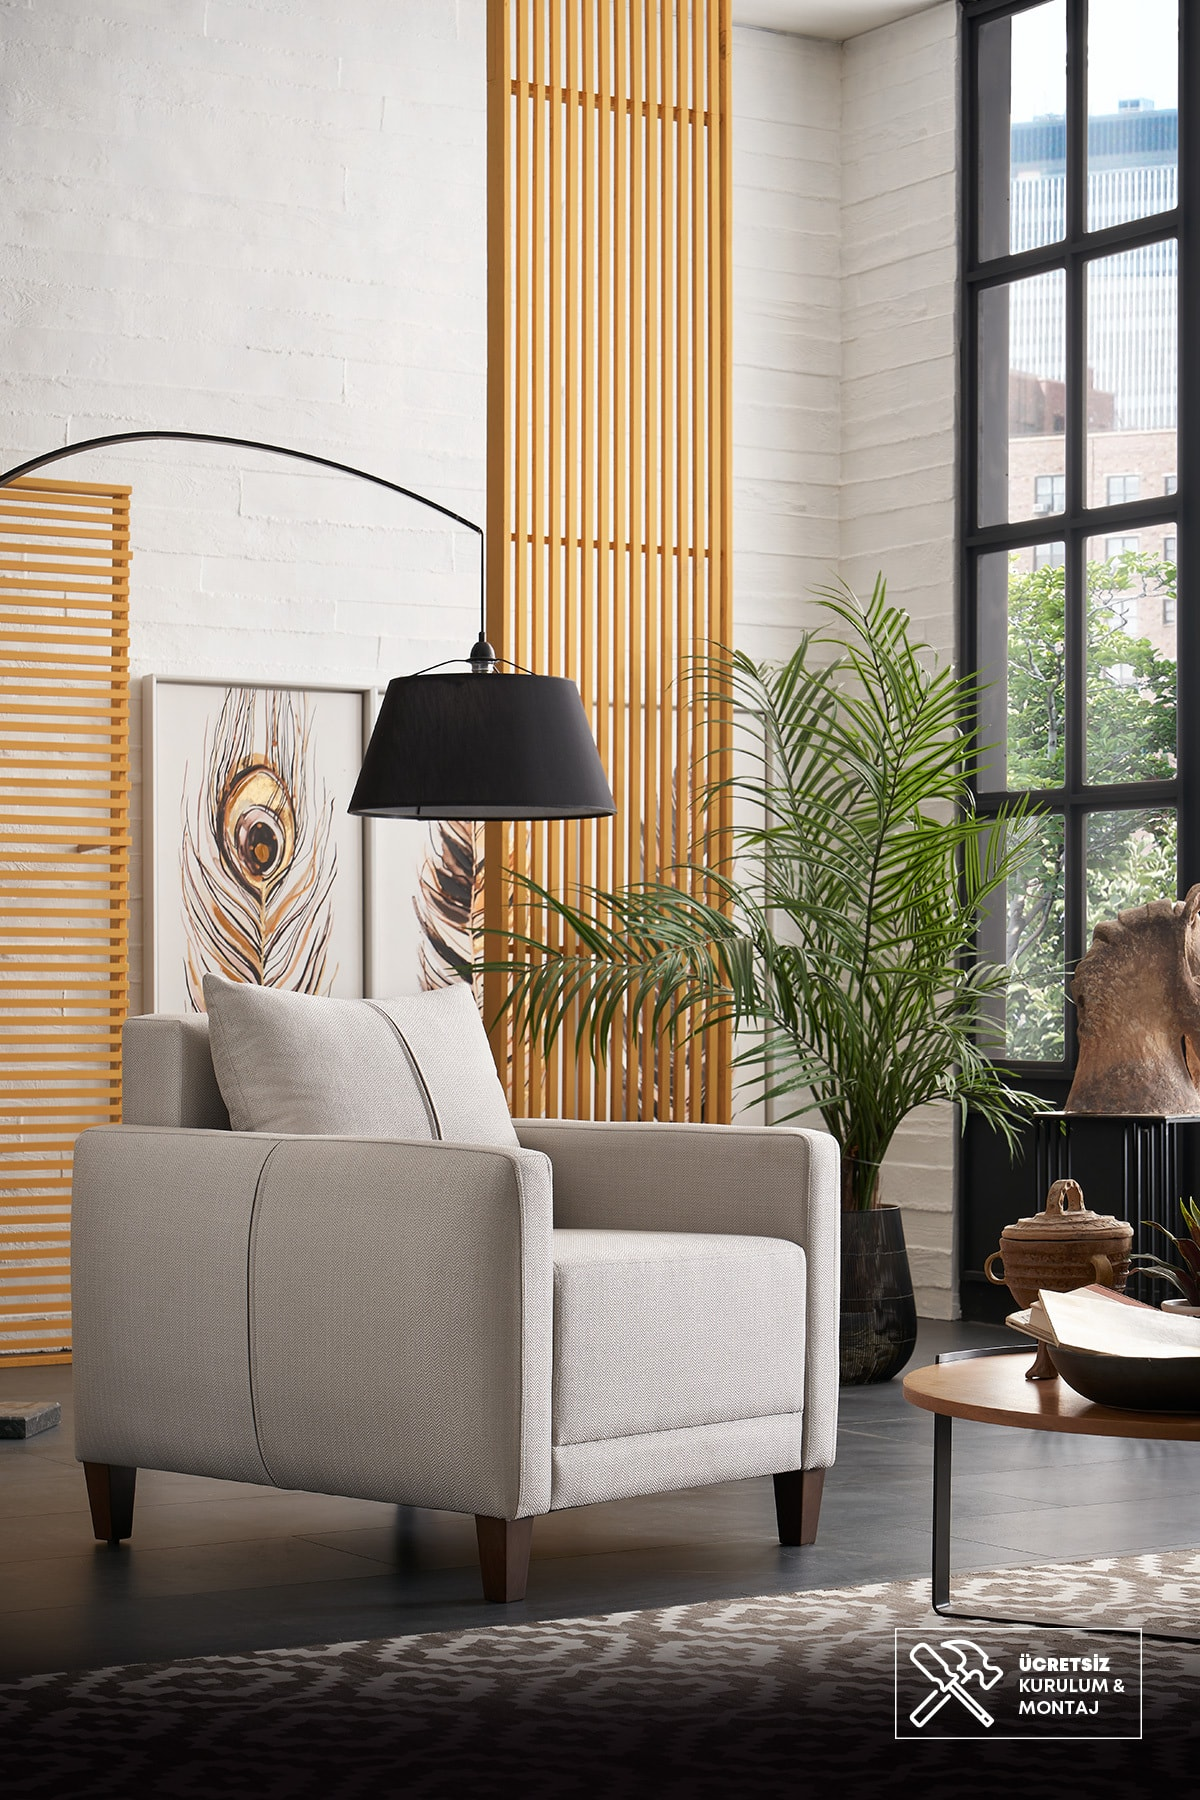 Enza Home Smart Berjer (AÇIK GRİ-KETEN DESENLİ KUMAŞ)